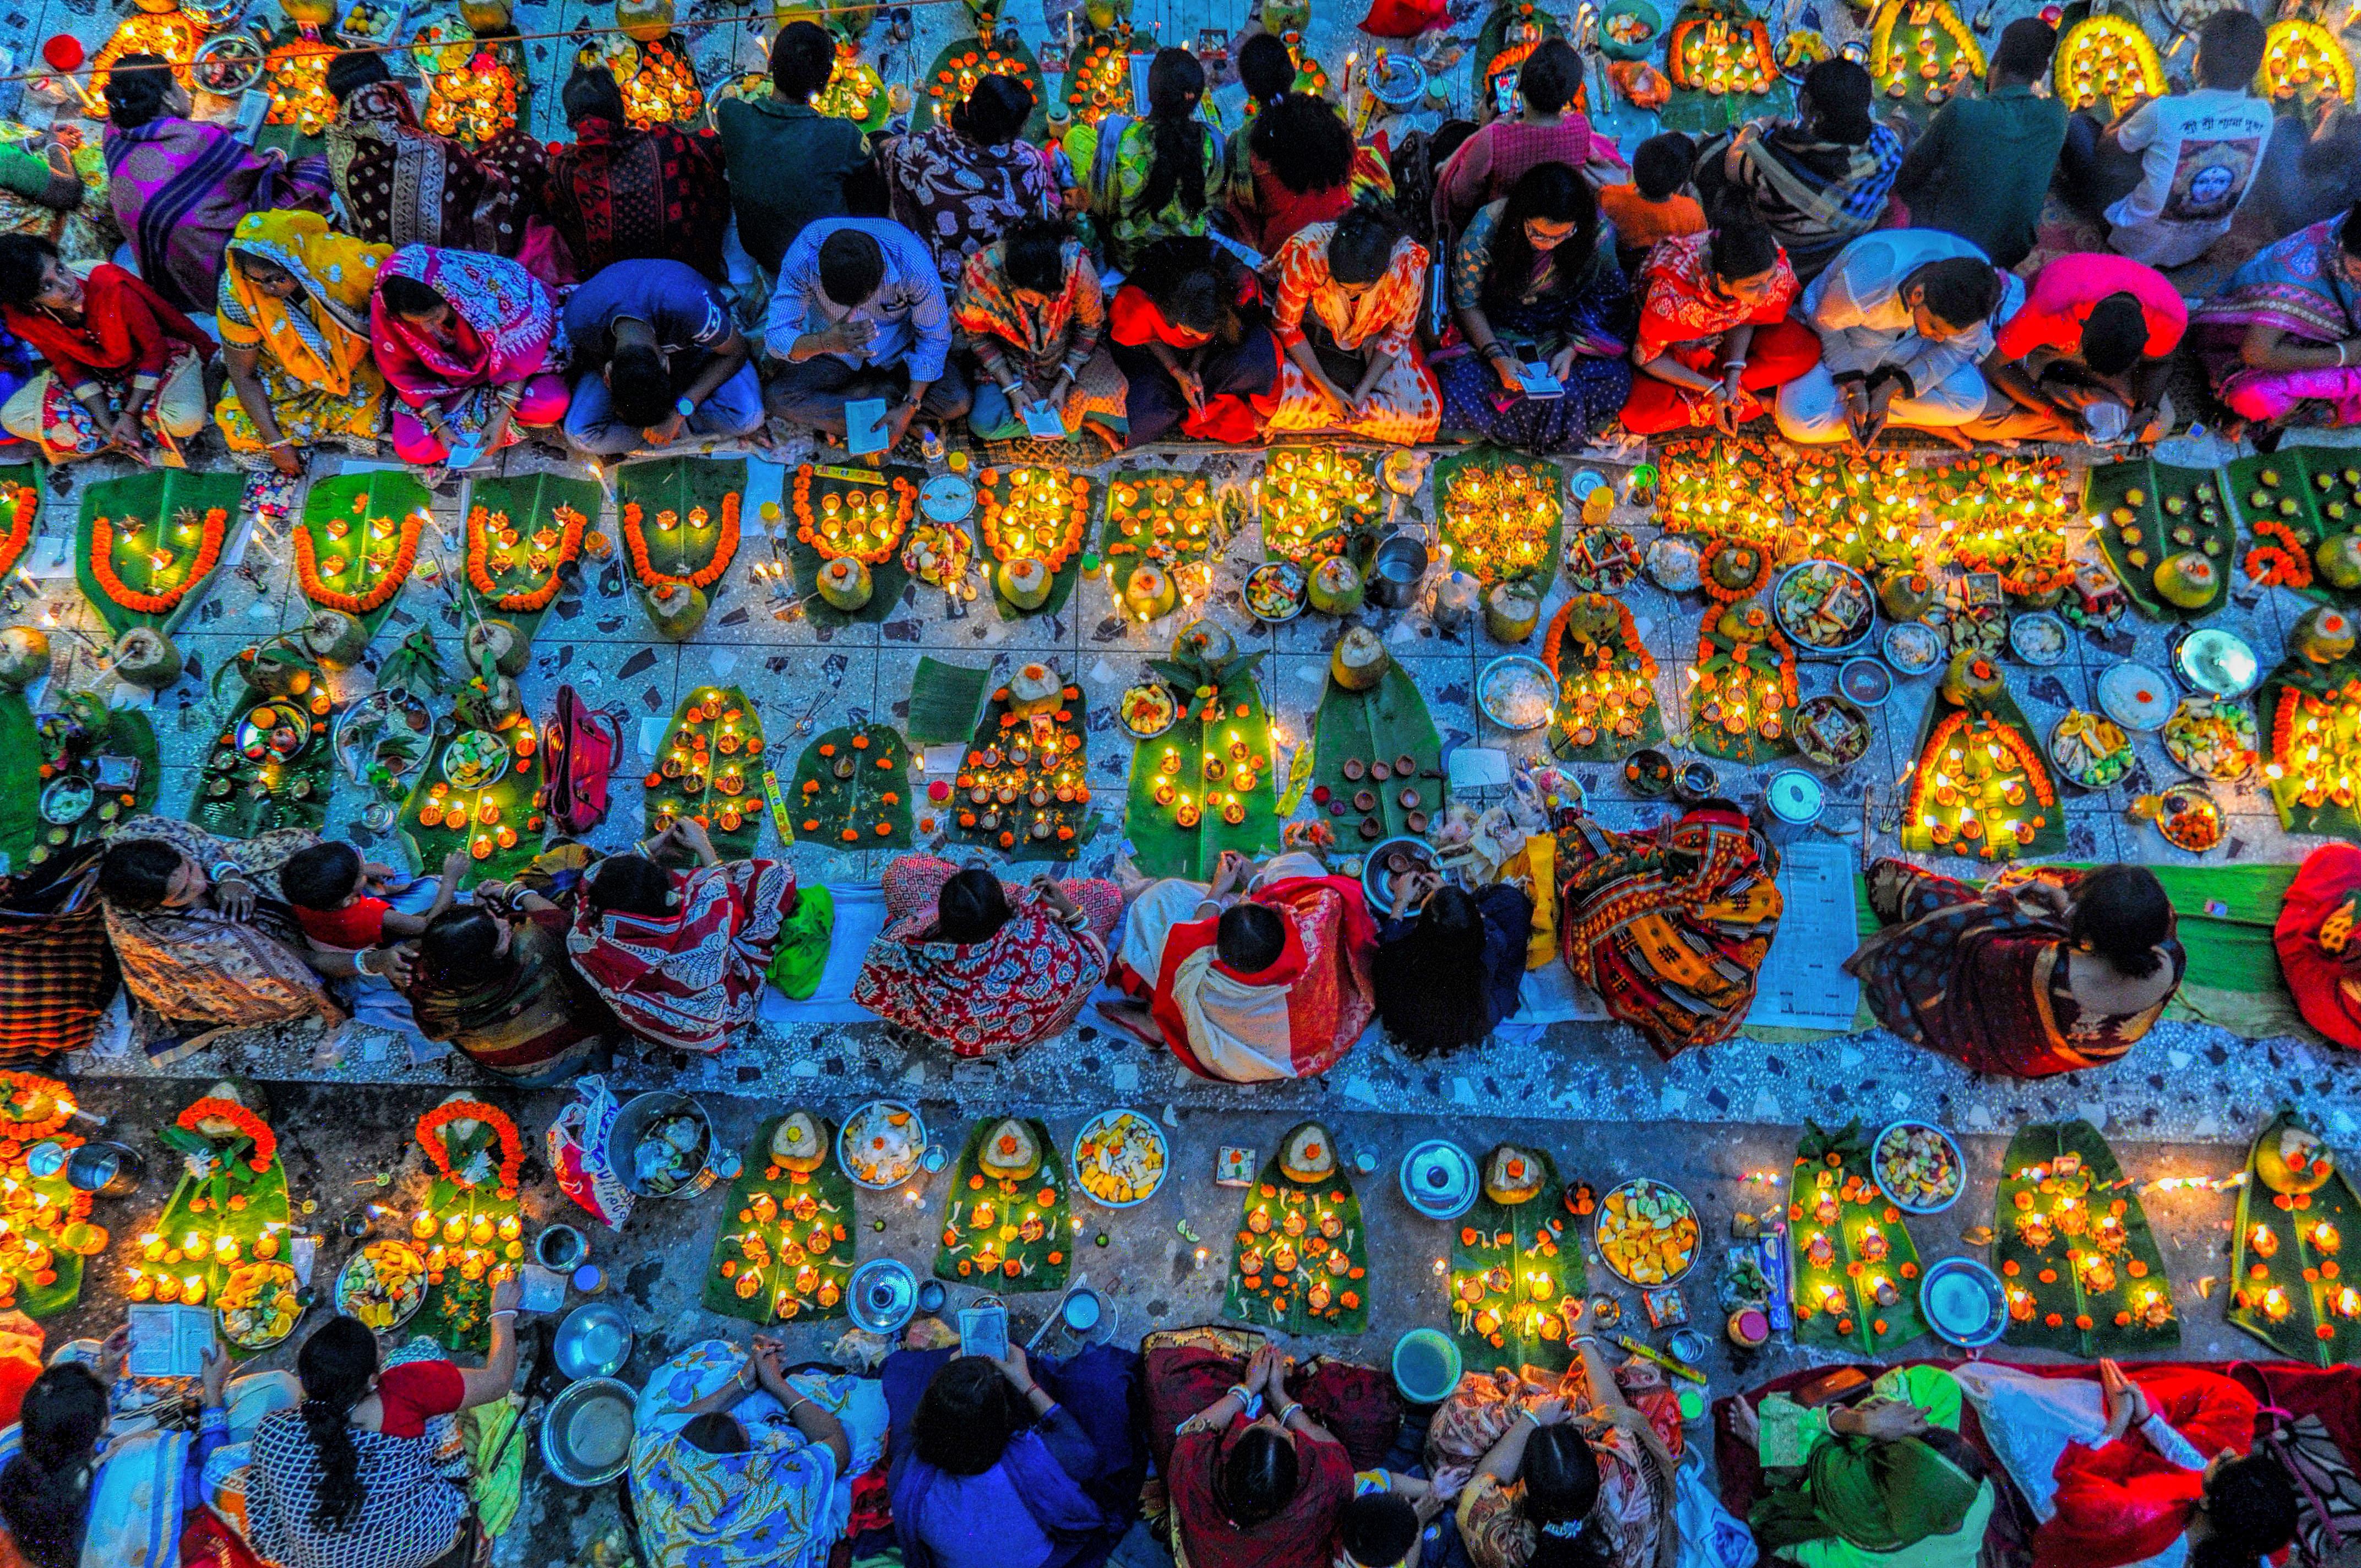 Fasting Festival, Rakher Upobash, Bangladesh